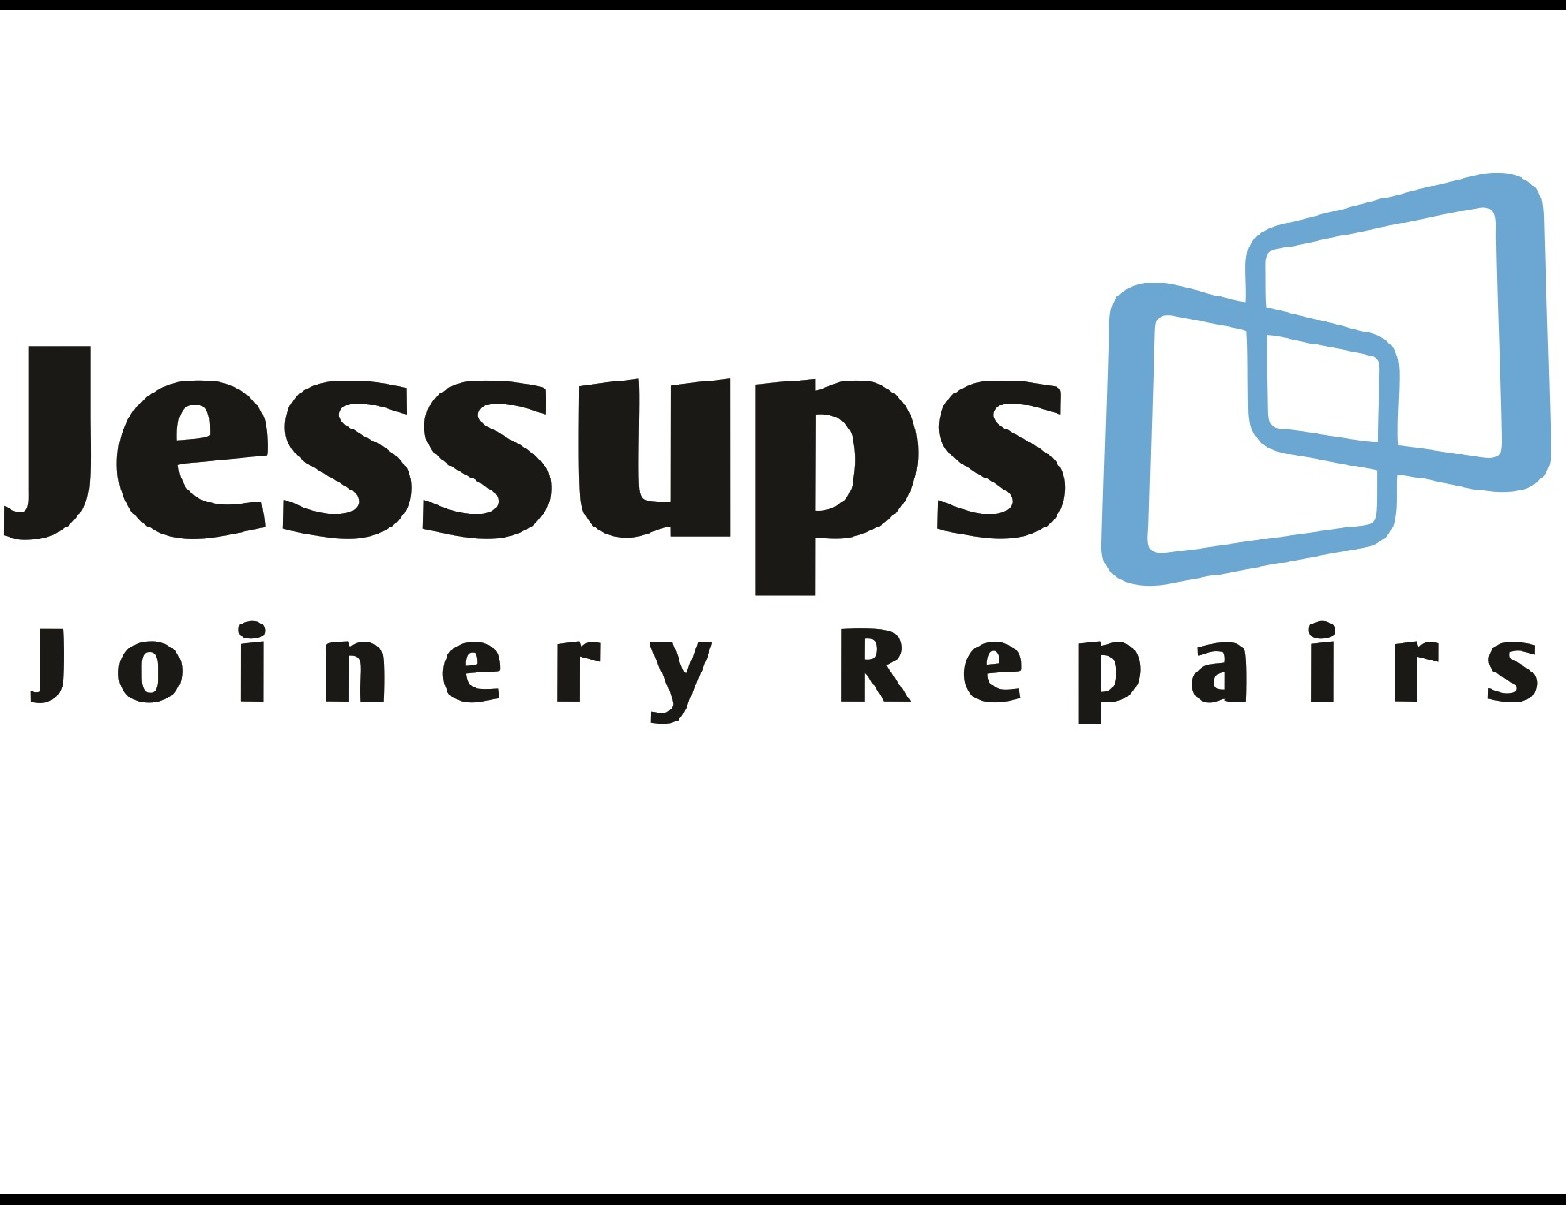 Jessups Joinery Repairs Ltd